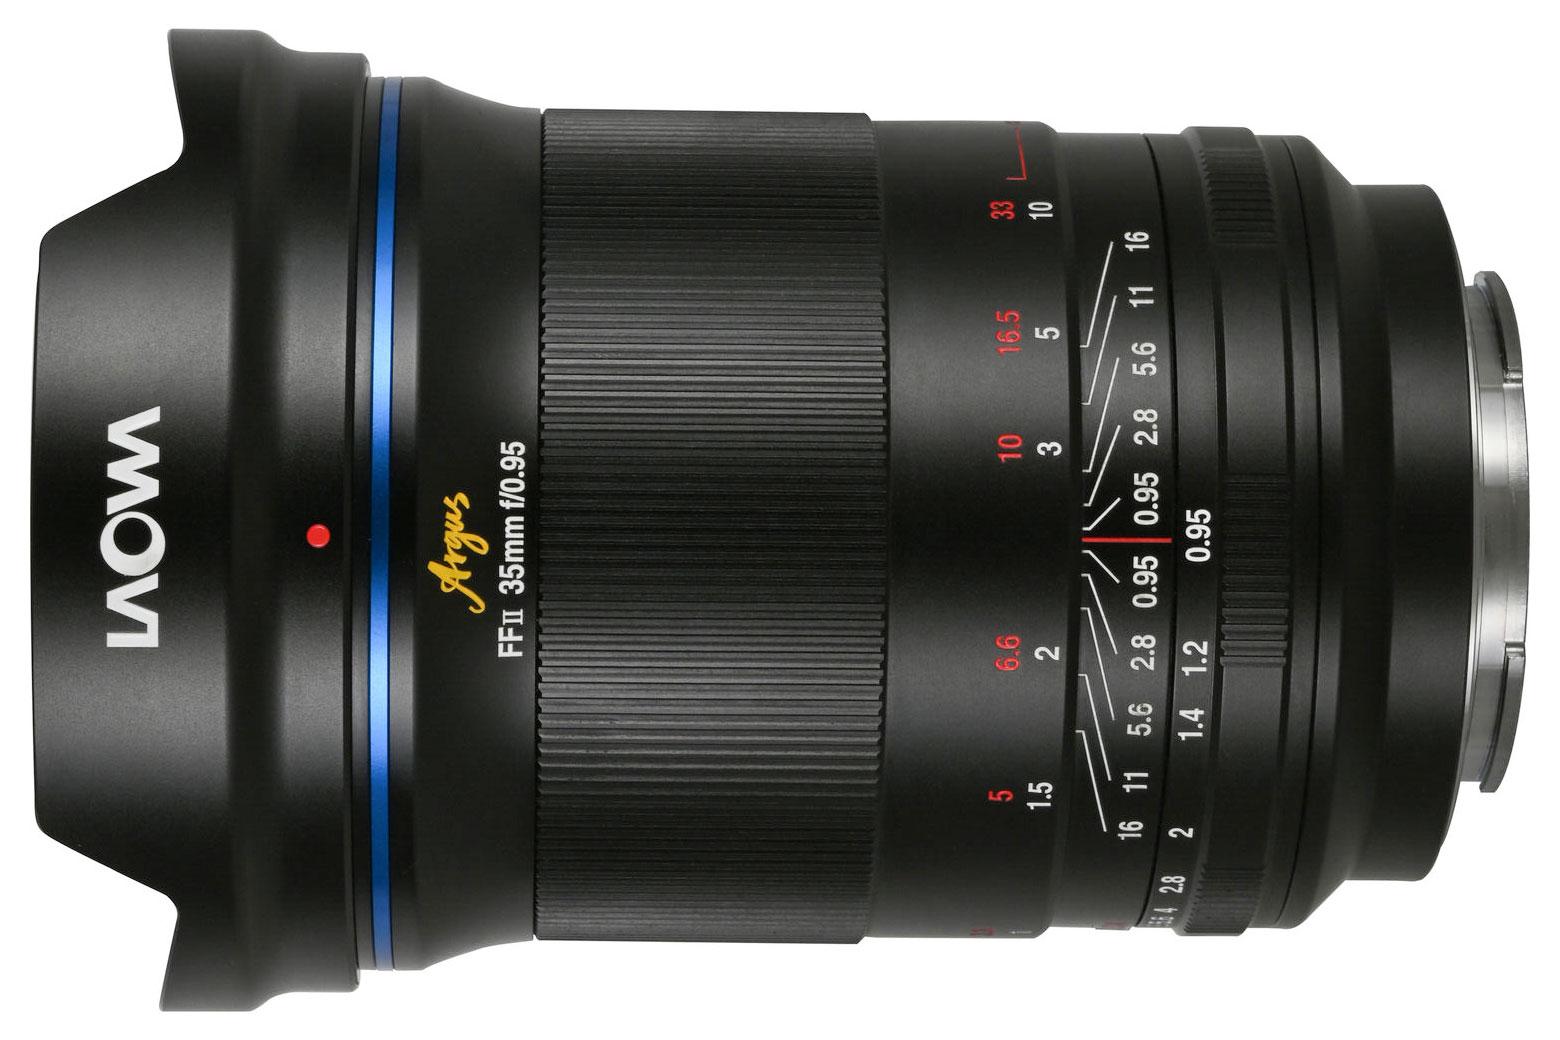 Laowa Argus 35mm f/0.95 FF lens